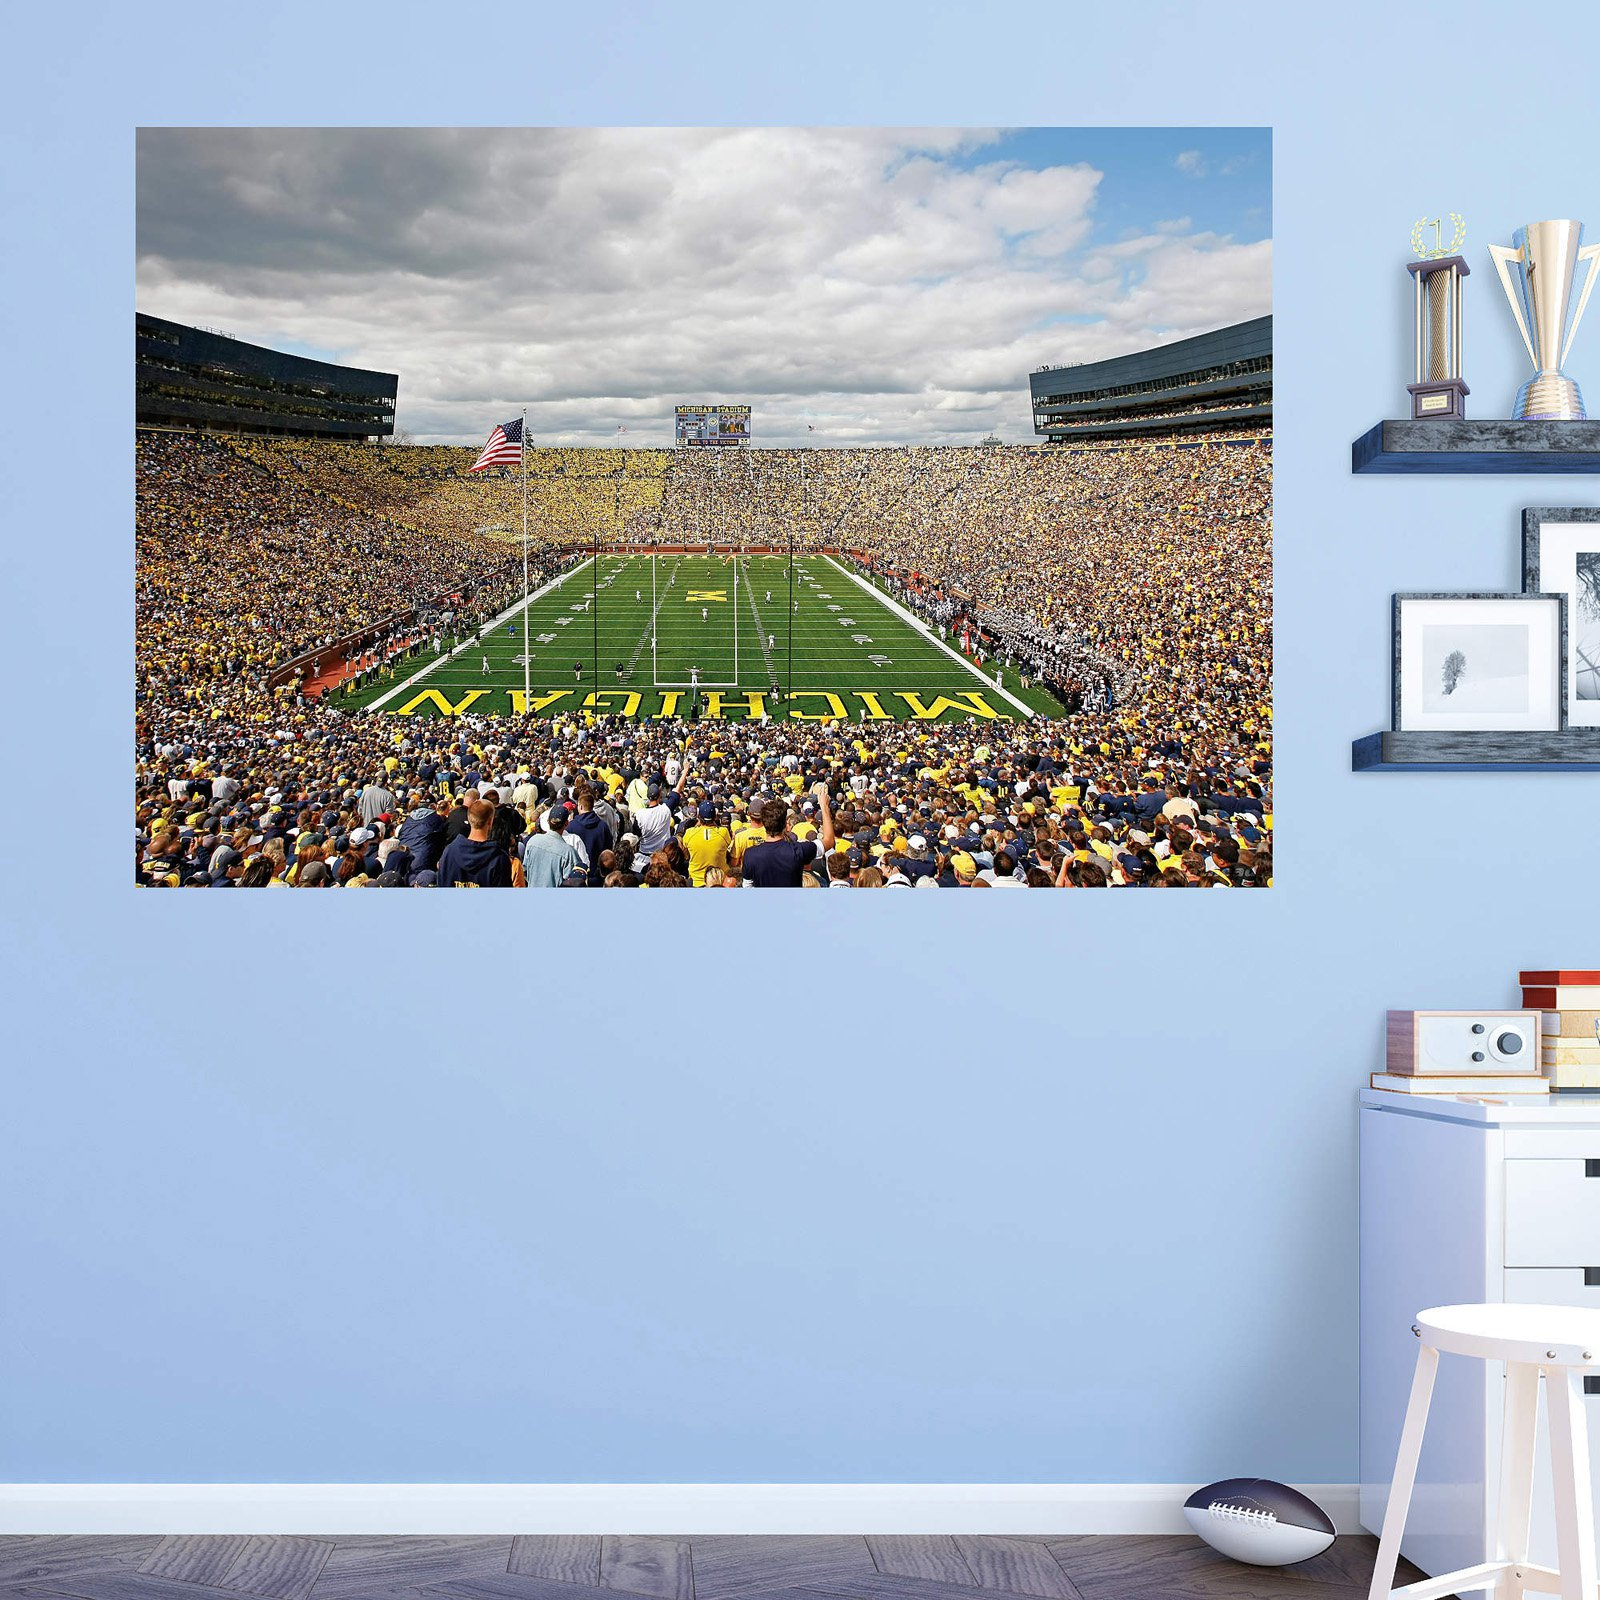 Fathead NCAA Michigan Wolverines Michigan Stadium The Big House Wall Mural